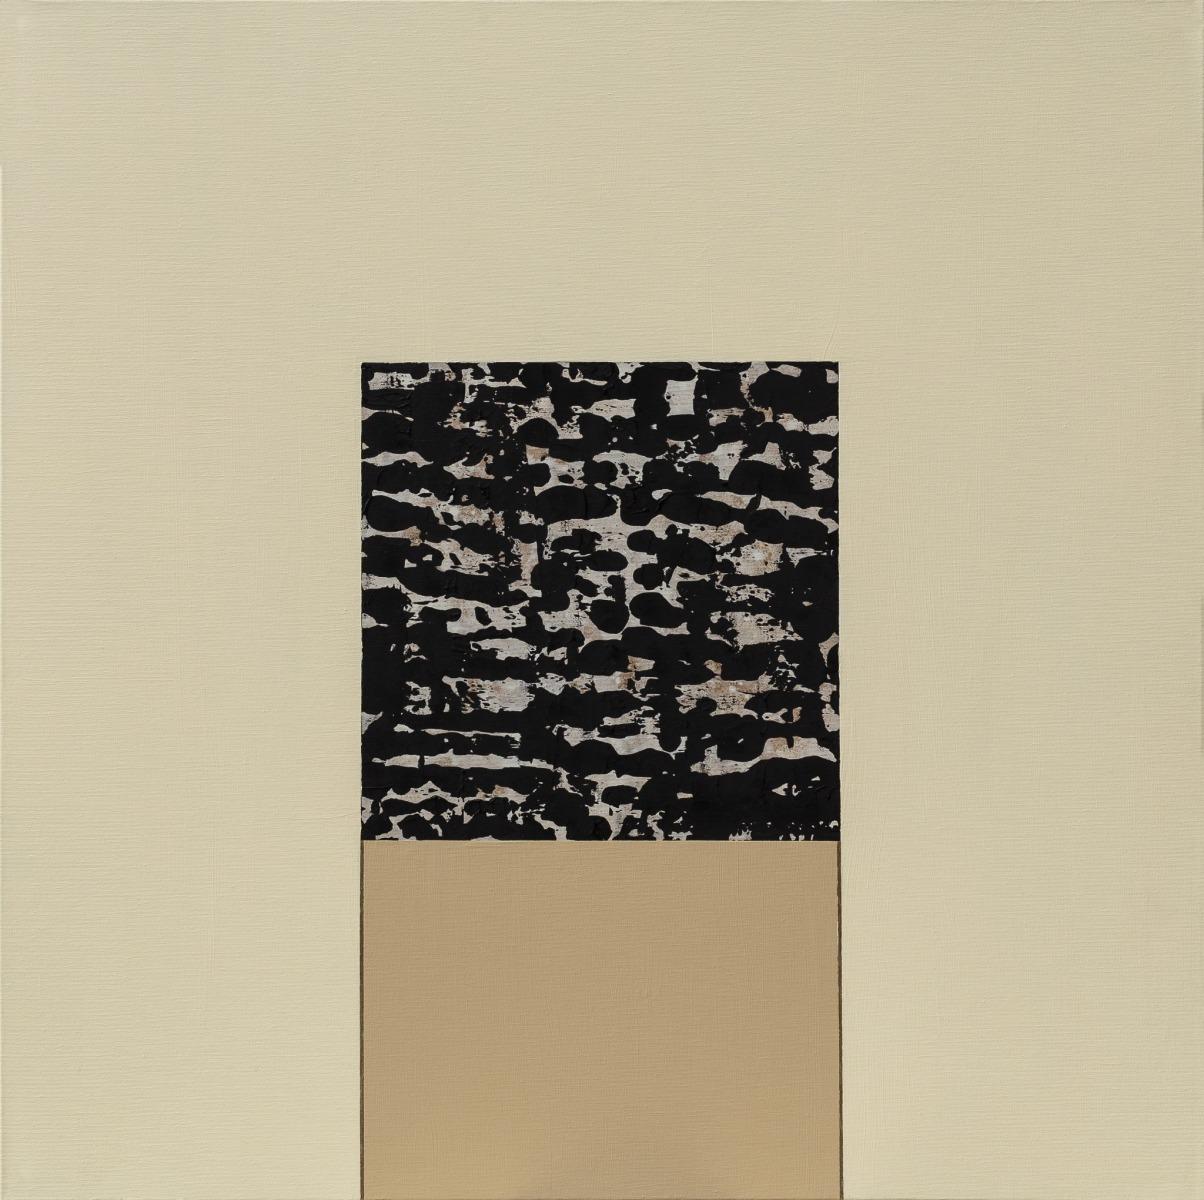 csaladi_kriszta_new_paintings_img_0880